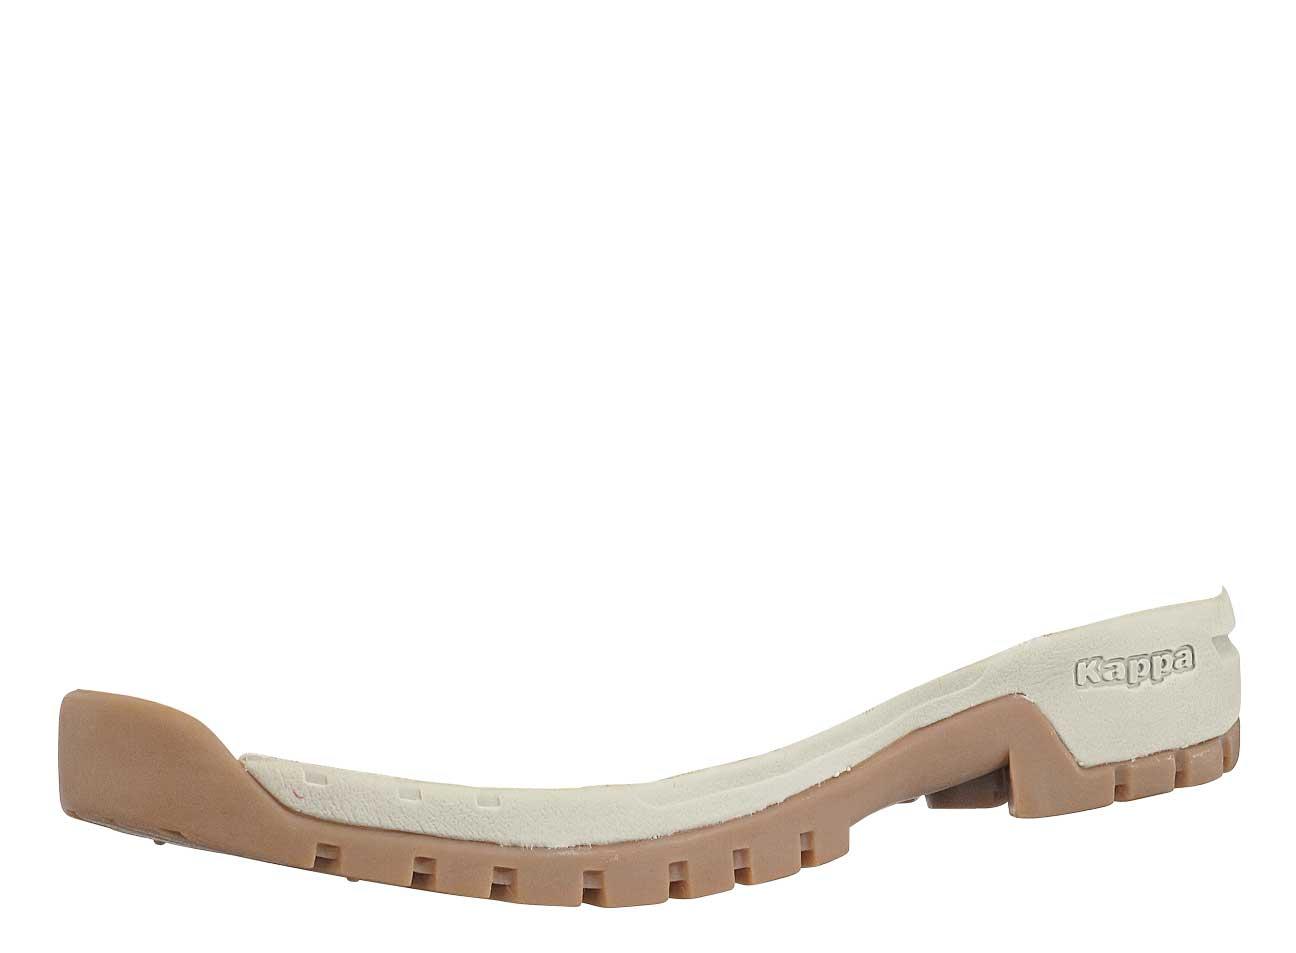 Schuh Sohle Animation